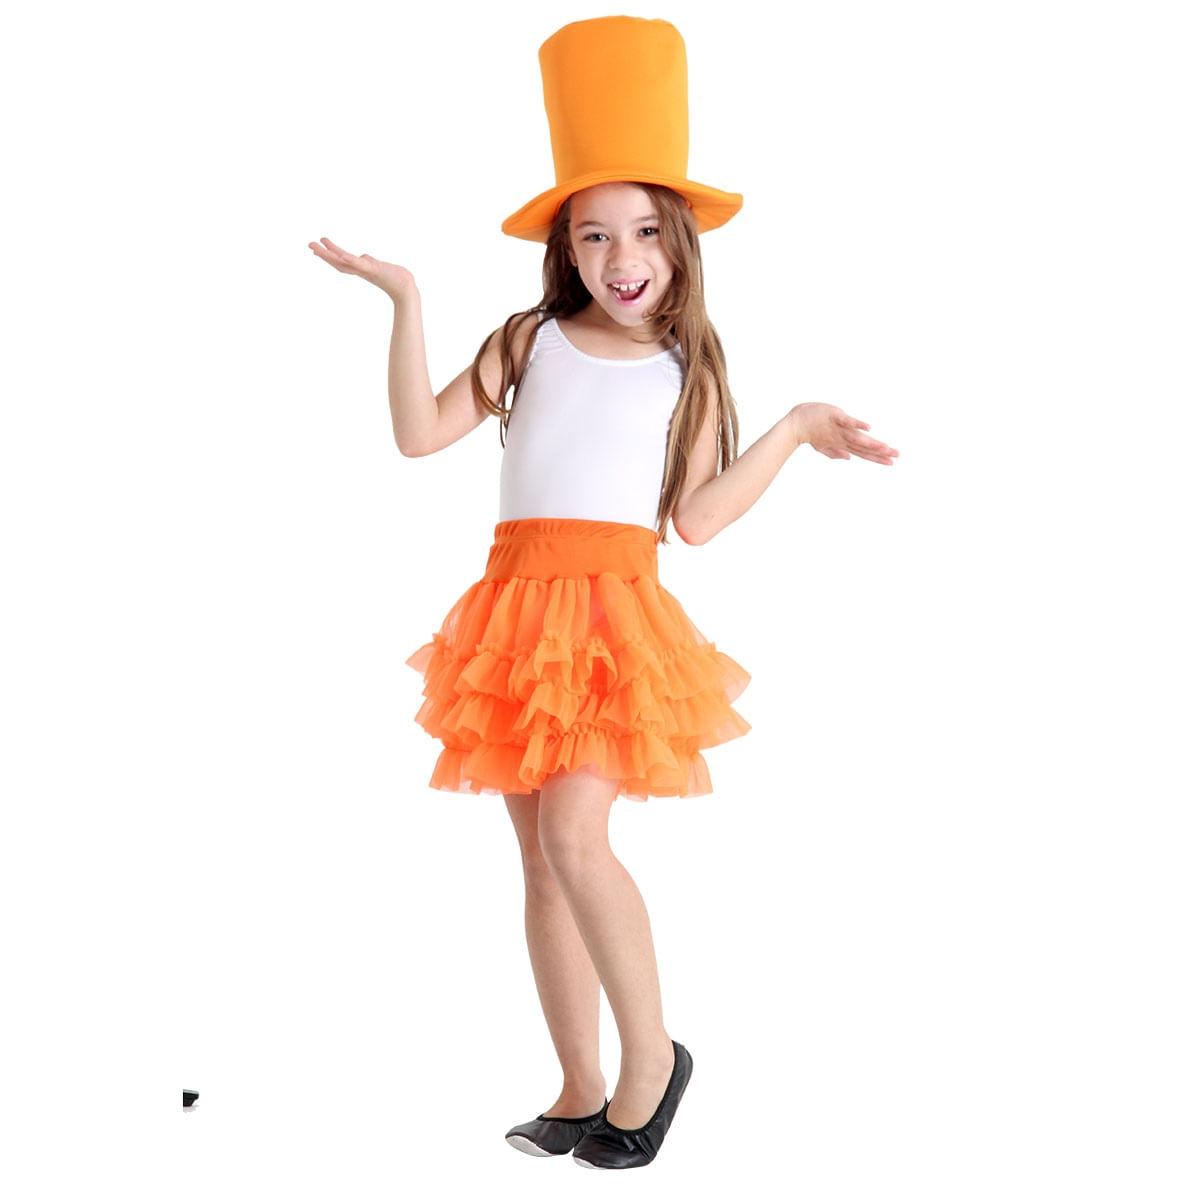 Fantasia Make Your Own - Saia Tutu Laranja Infantil G